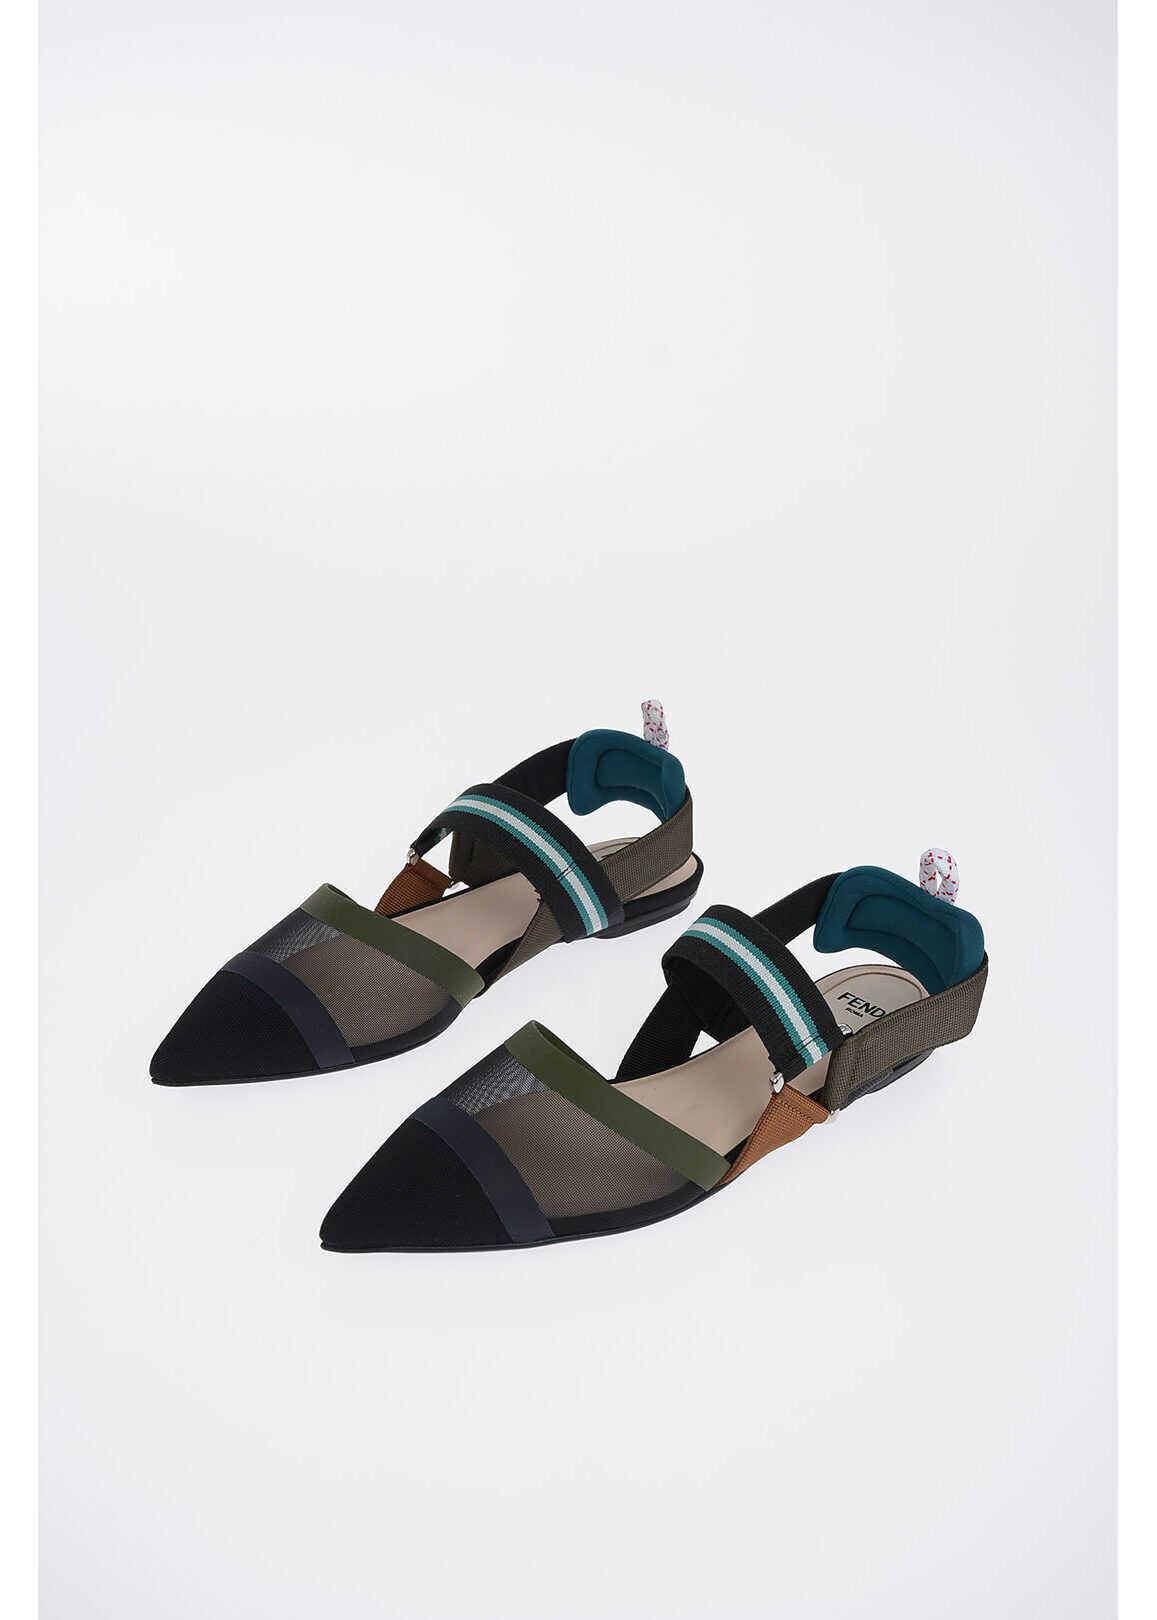 Fendi leather sabot MULTICOLOR